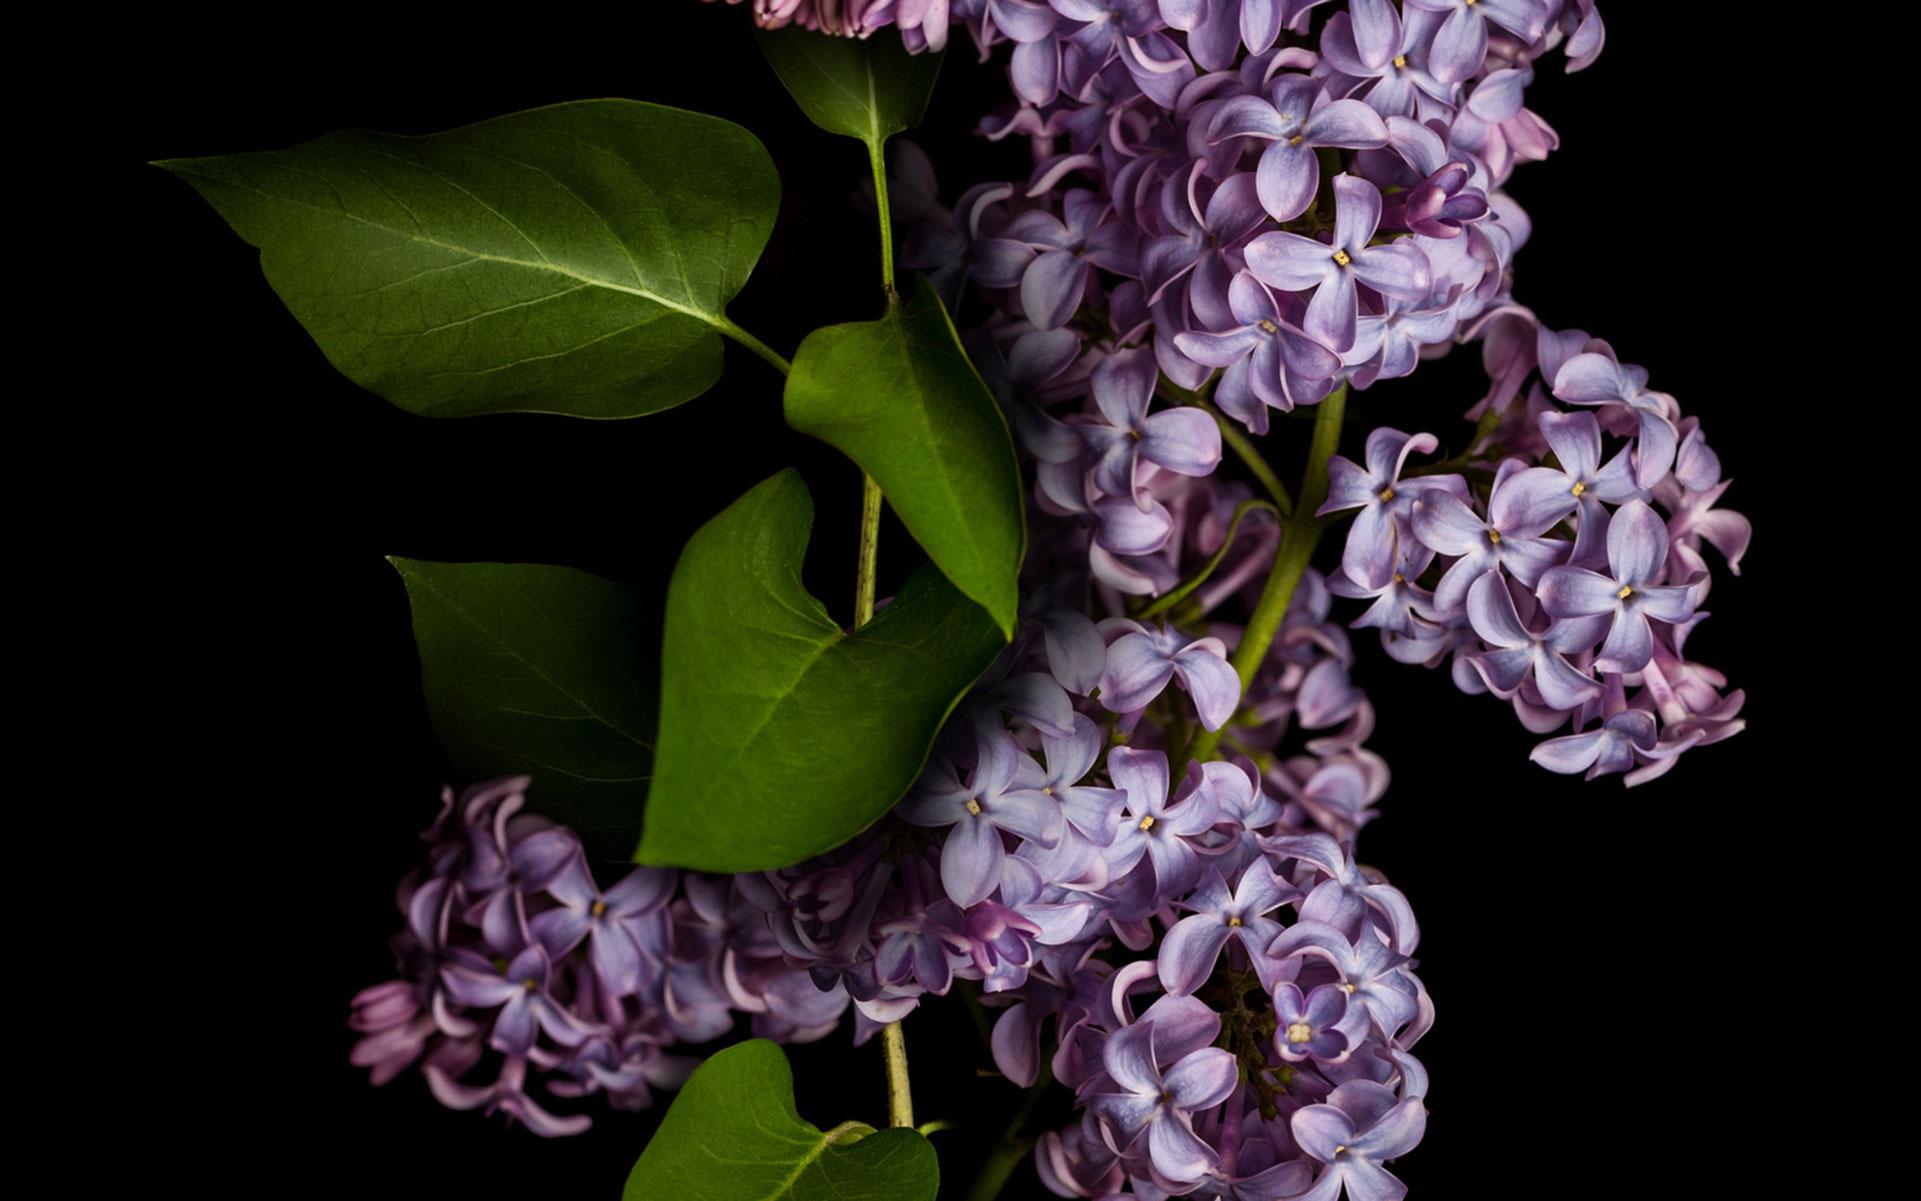 Terpinolene: The Least-Common Common Terpene